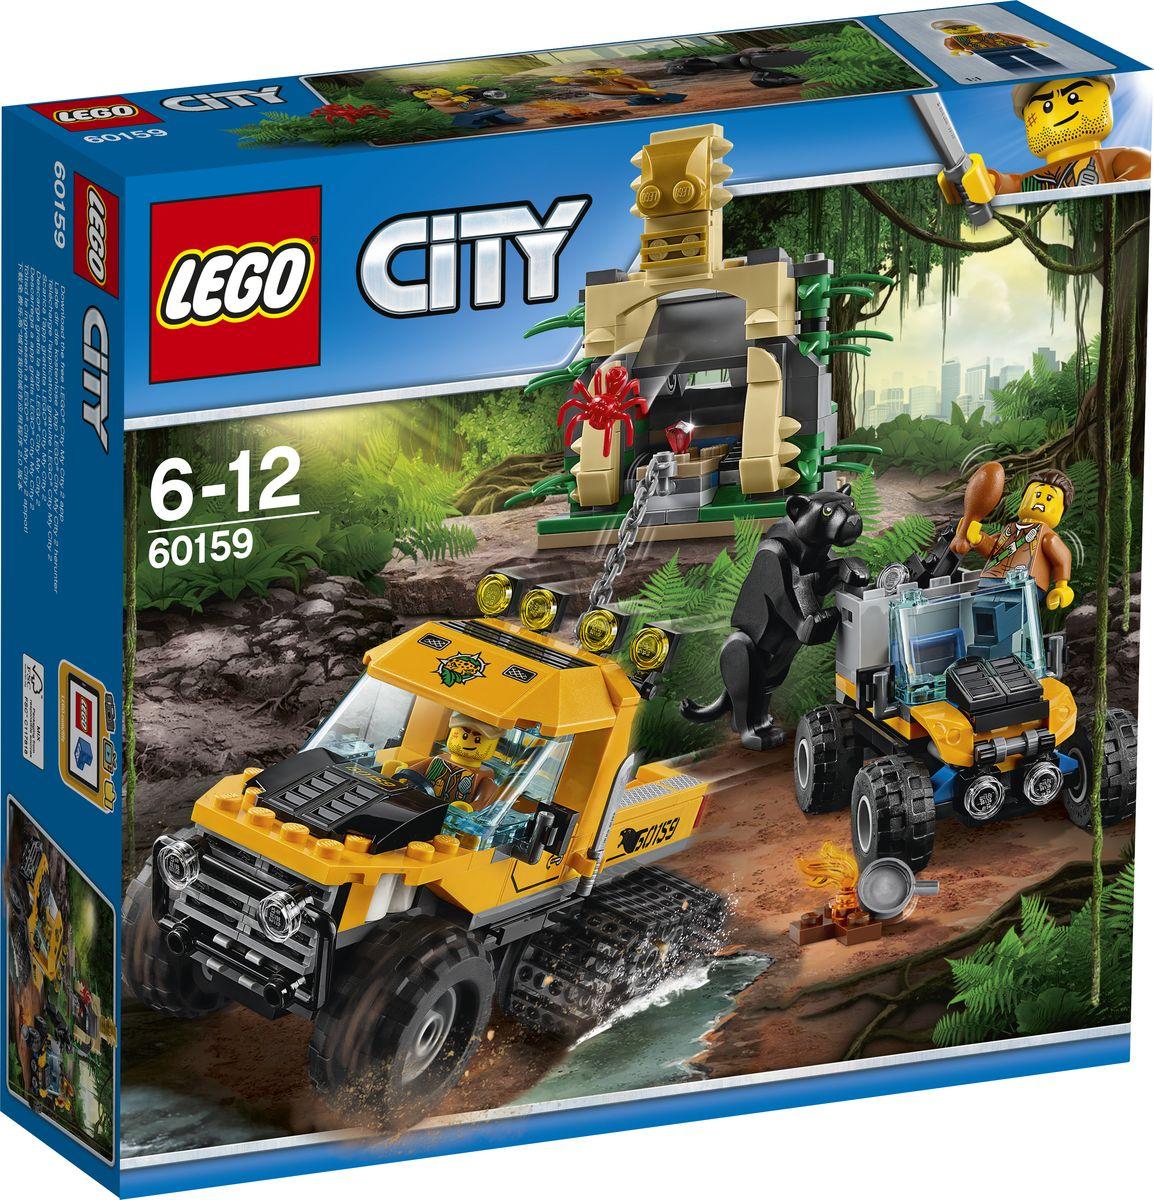 LEGO City Jungle Explorer Конструктор Миссия Исследование джунглей 60159 конструктор lego city jungle explorer исследование джунглей 60159